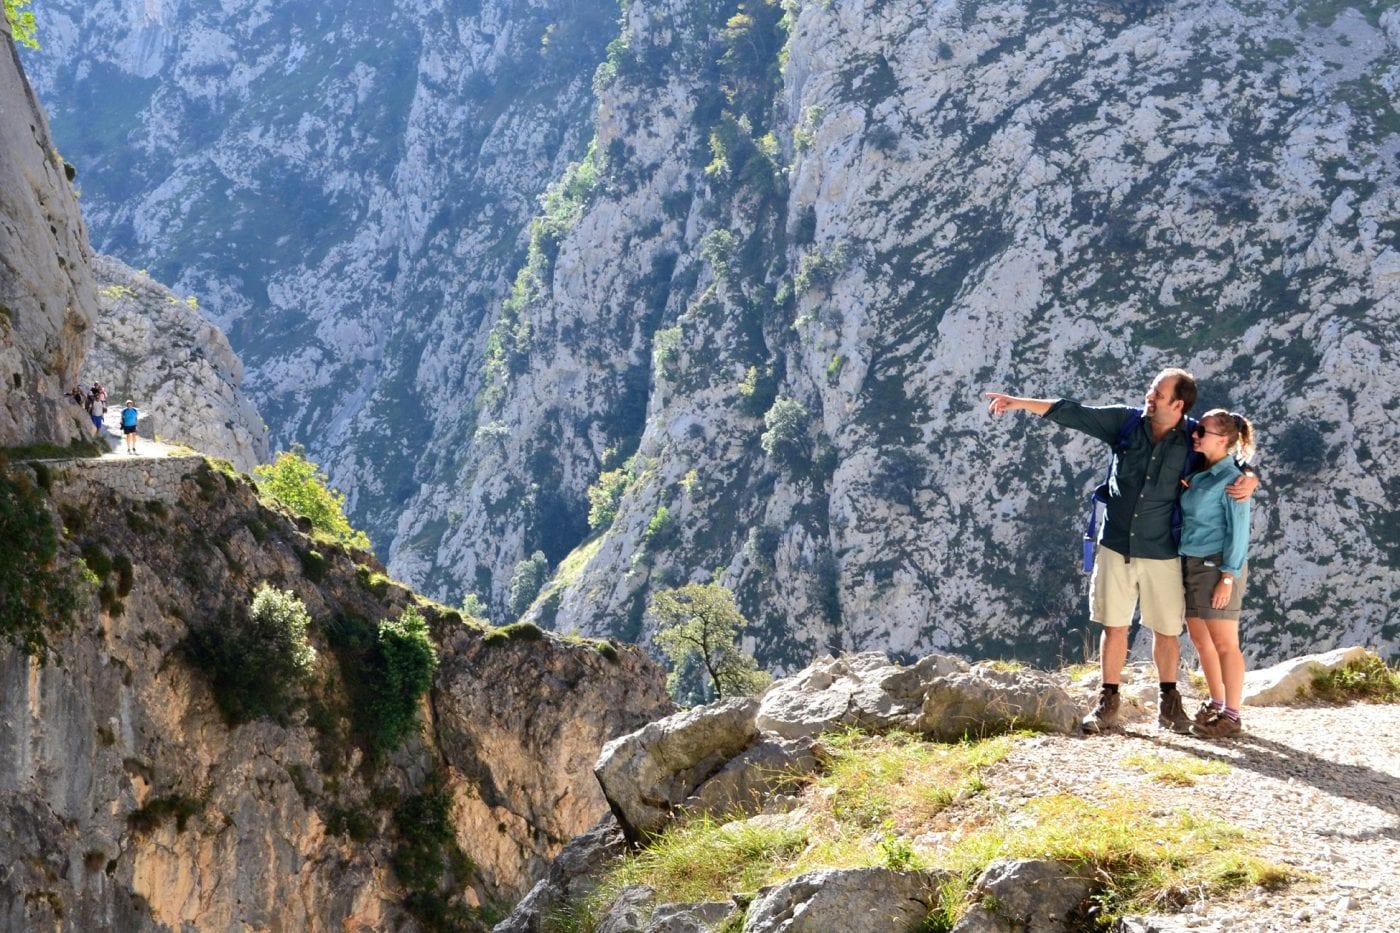 picos de europa maz and emma looking accross the gorge